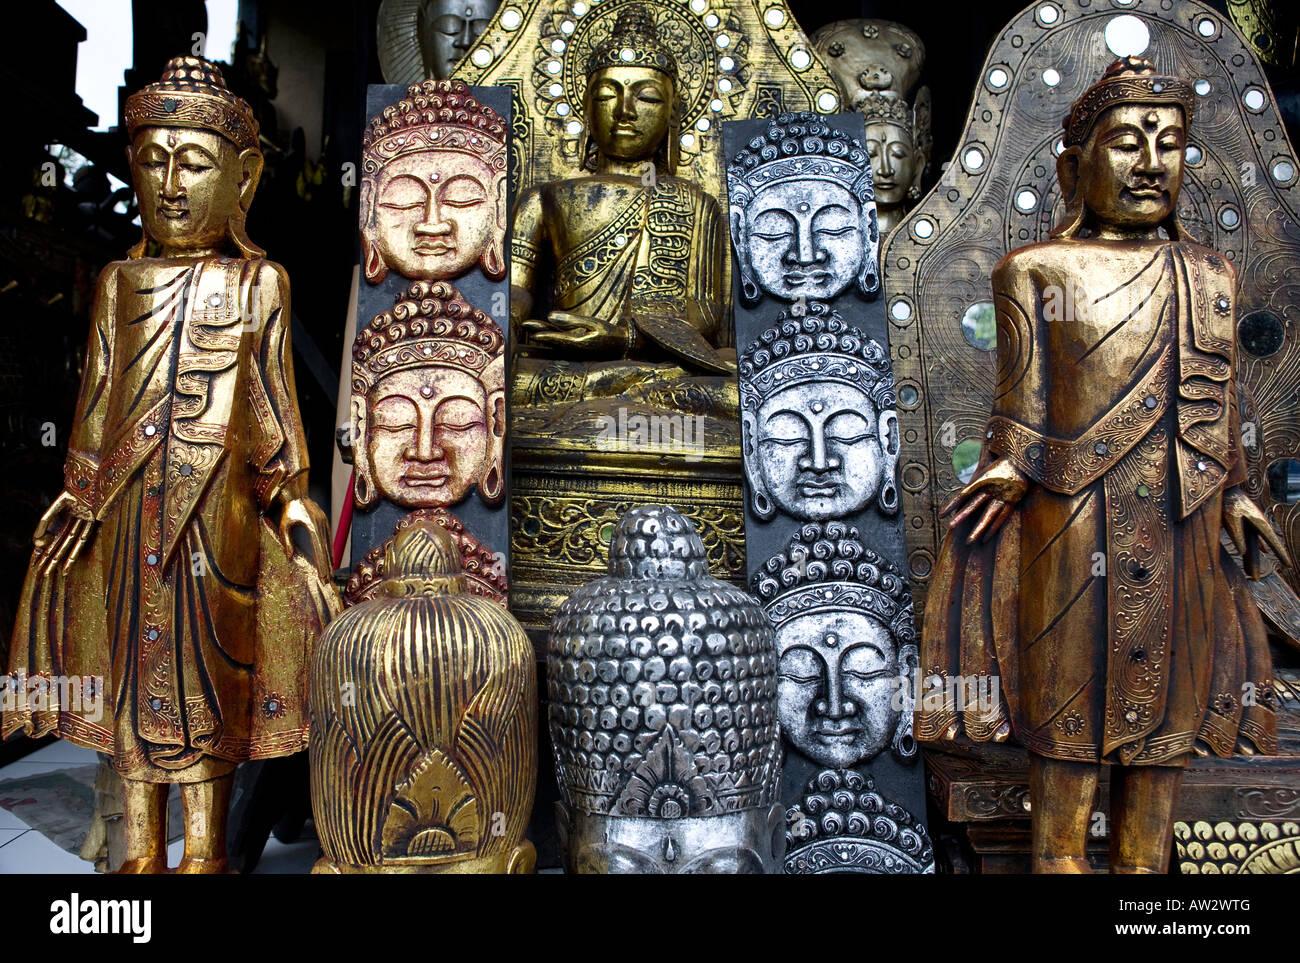 Silver And Gold Buddha Statues Ubud Bali Indonesia - Stock Image